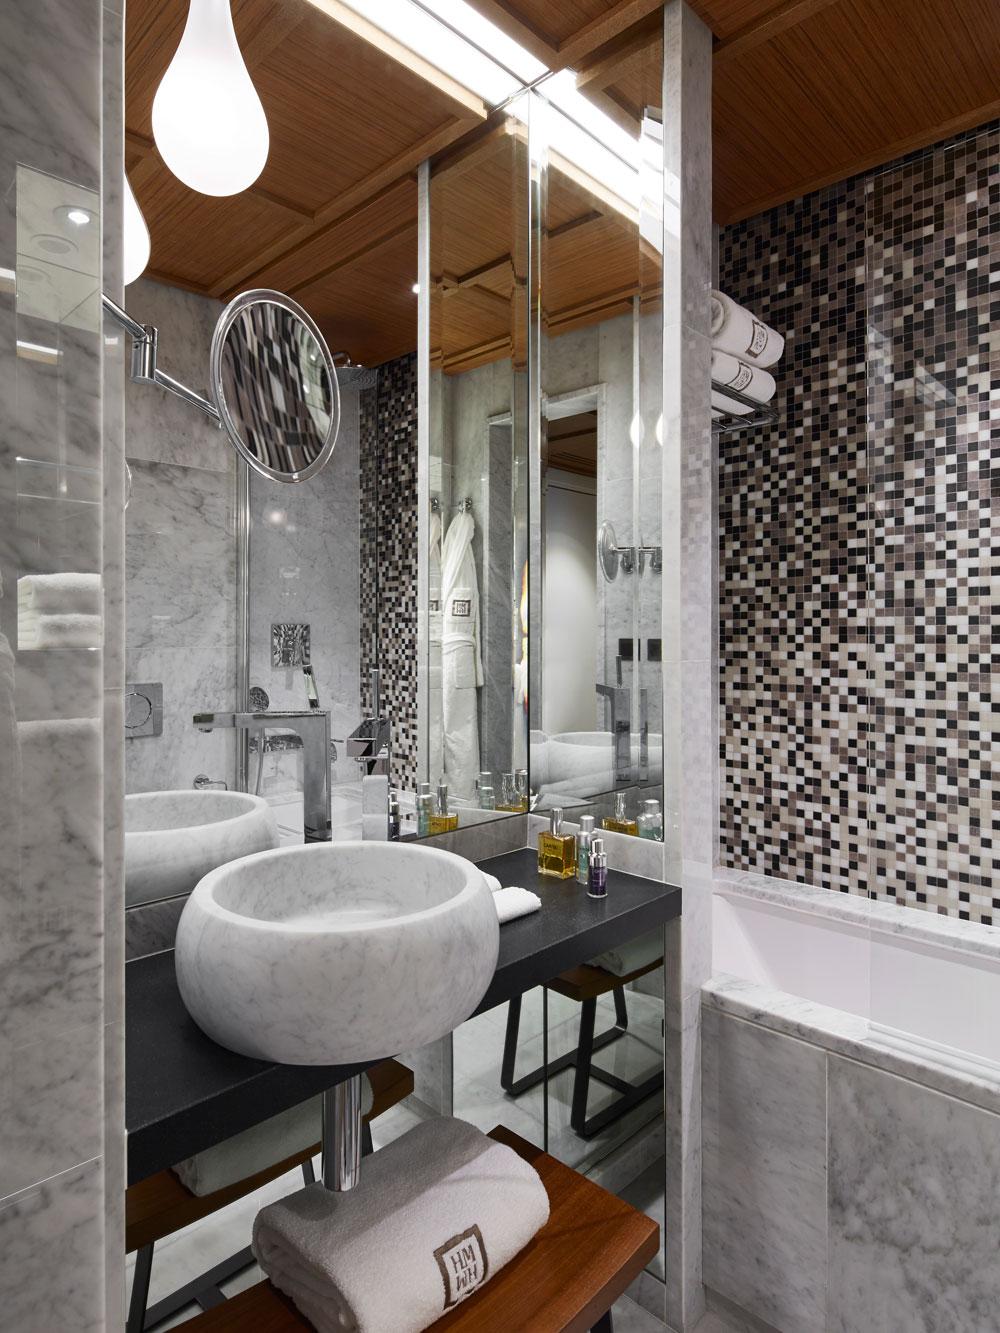 Salle de Bain vasque massive dallage mur marbre blanc de carrare Hôtel Montalembert Omni Marbres